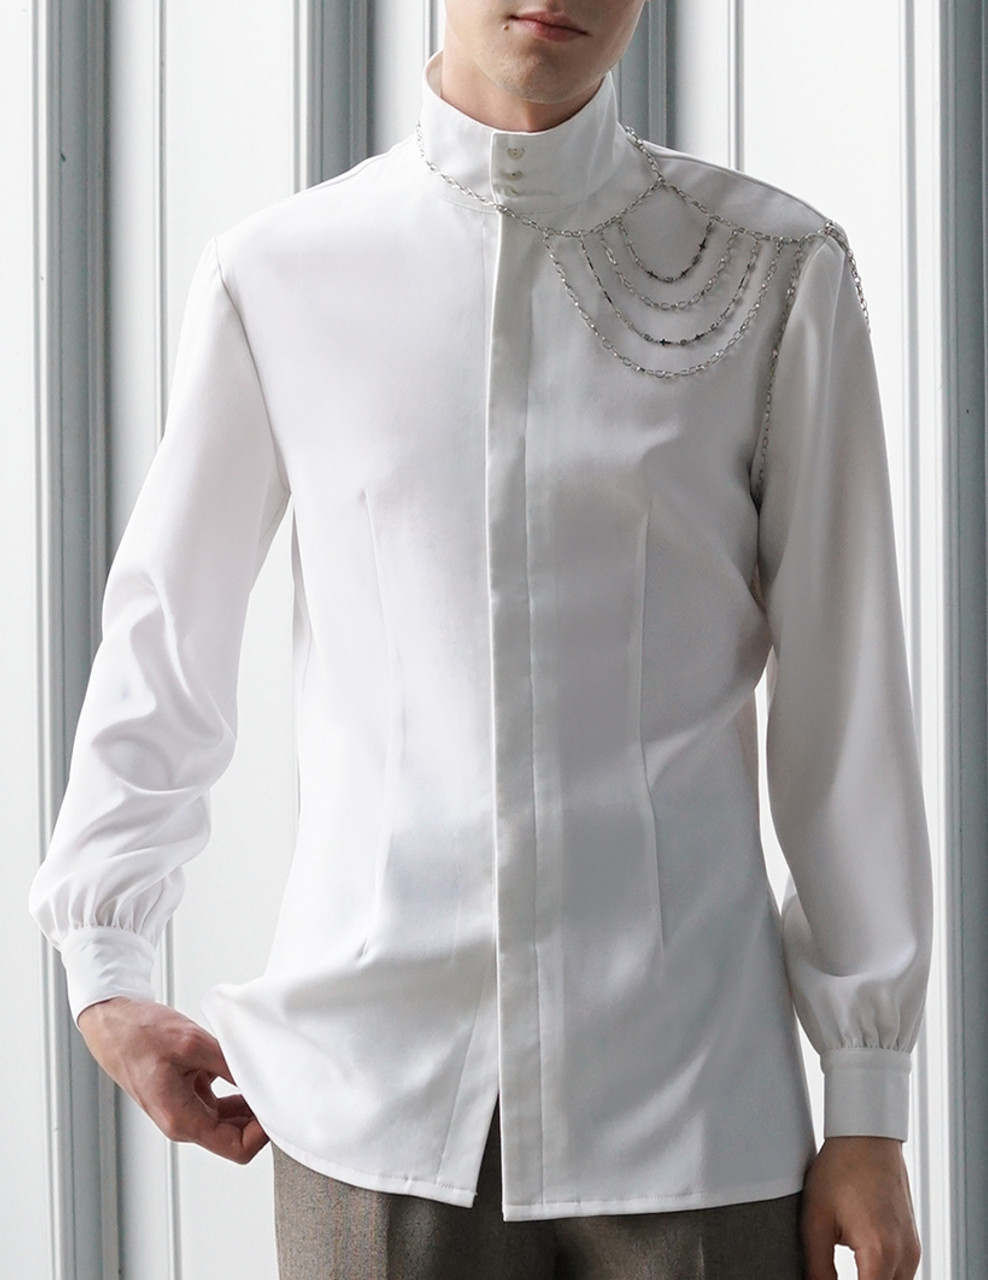 Elegant Gothic Dandy Ouji Stand Collar Unisex Shirt & Handmade Shoulder Chain V6WG37WFy